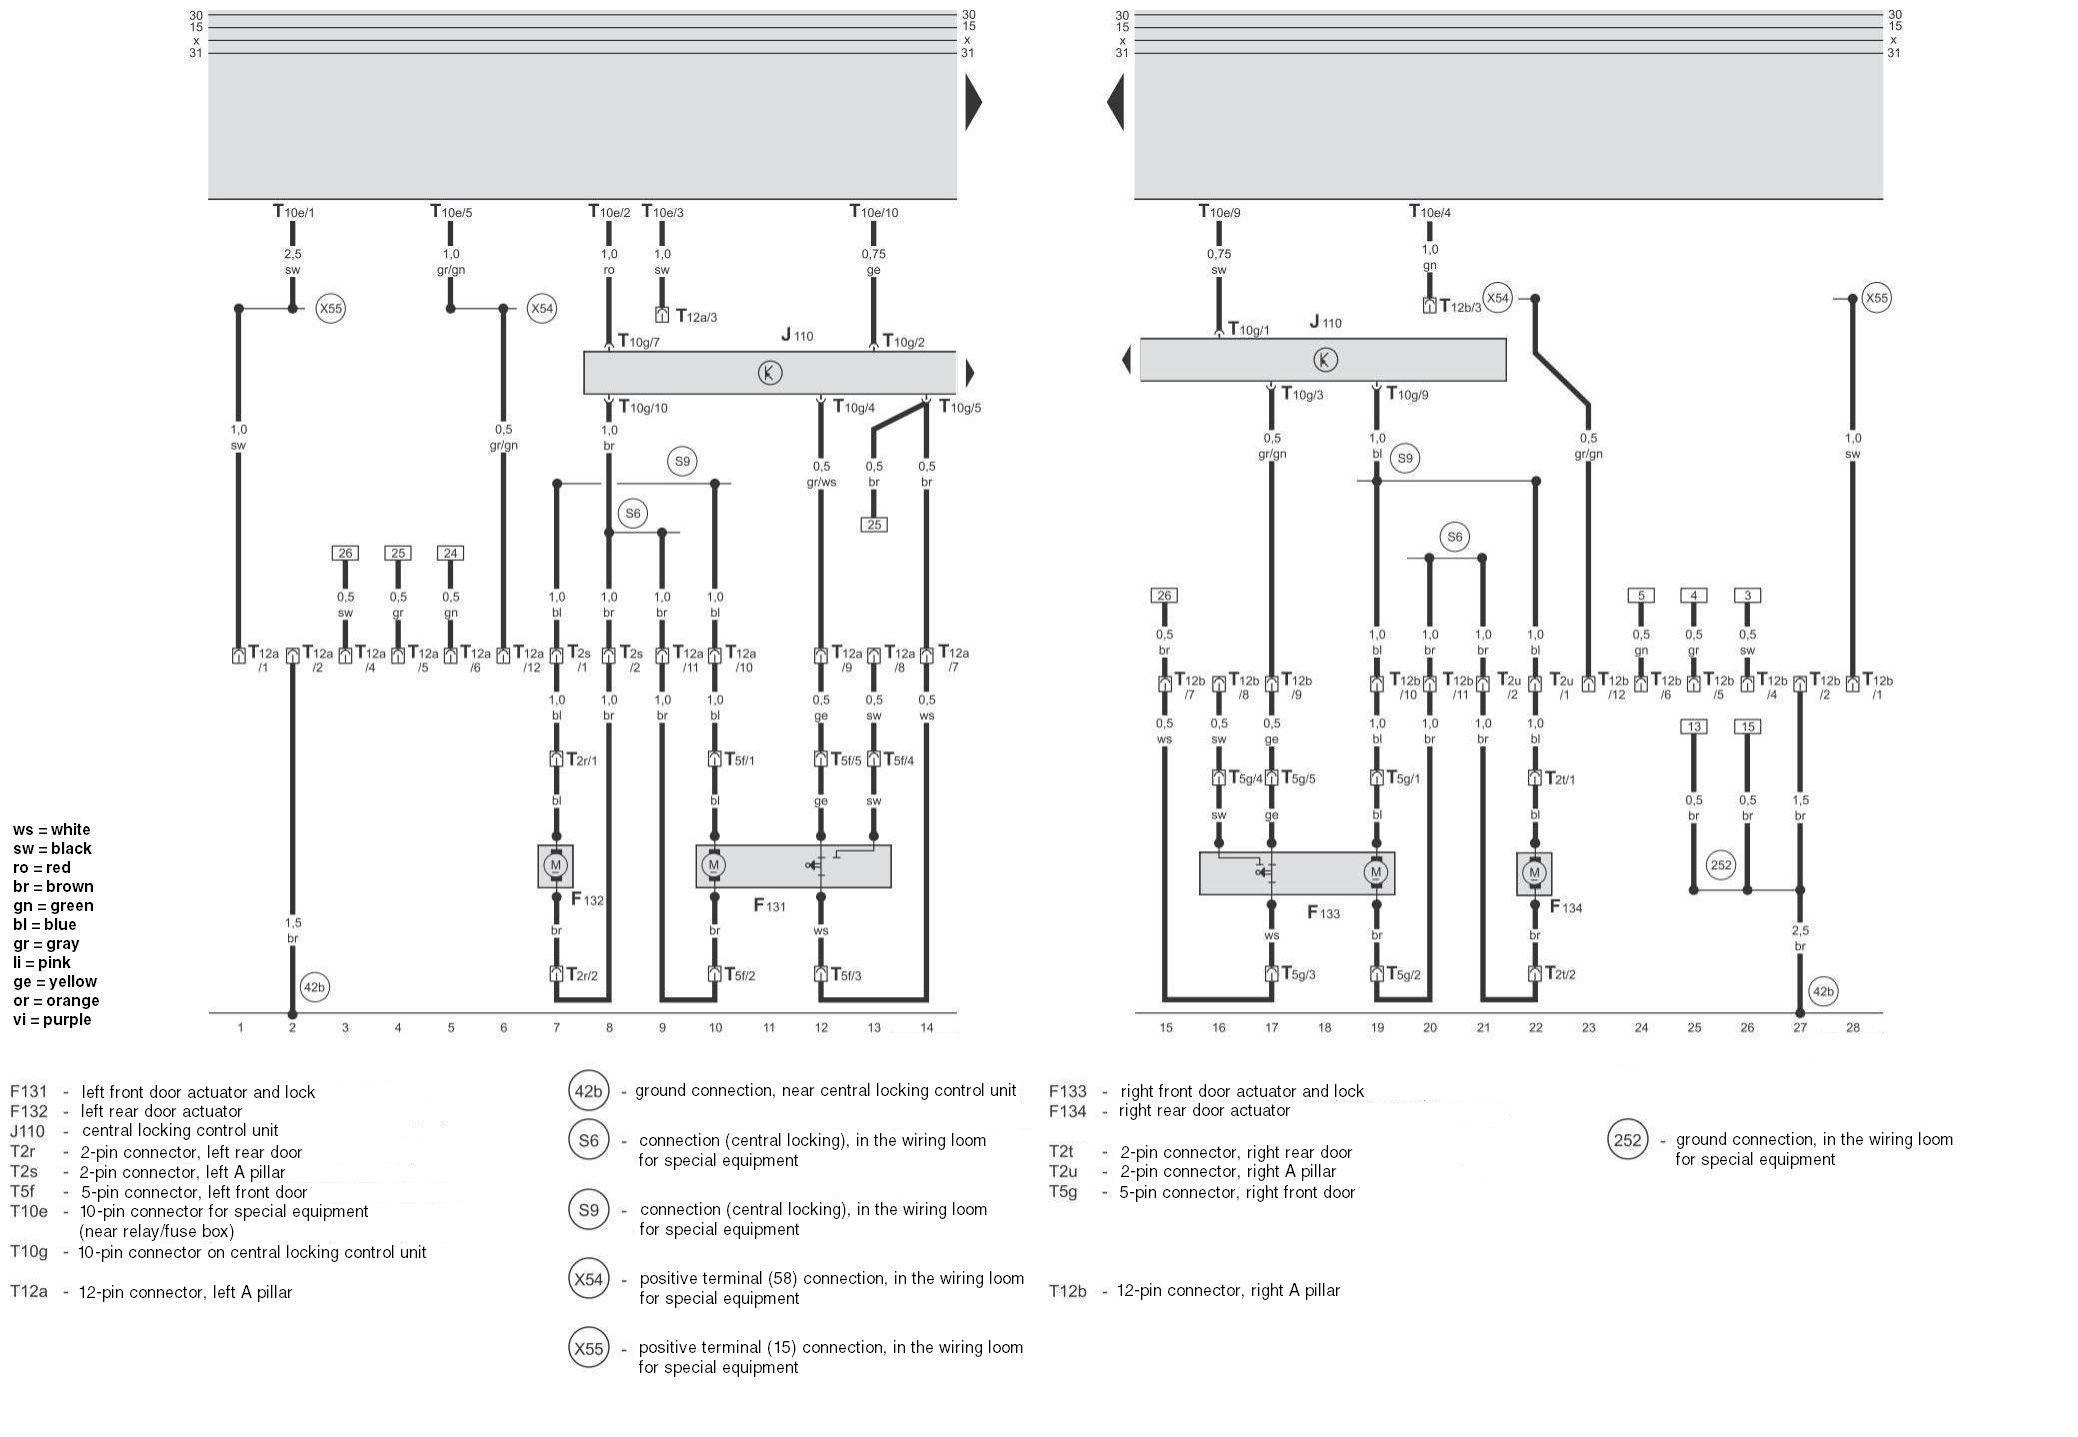 GA_5615] Skoda Fabia Mk1 Wiring Diagram Download DiagramLite Kicep Sianu Emba Mohammedshrine Librar Wiring 101